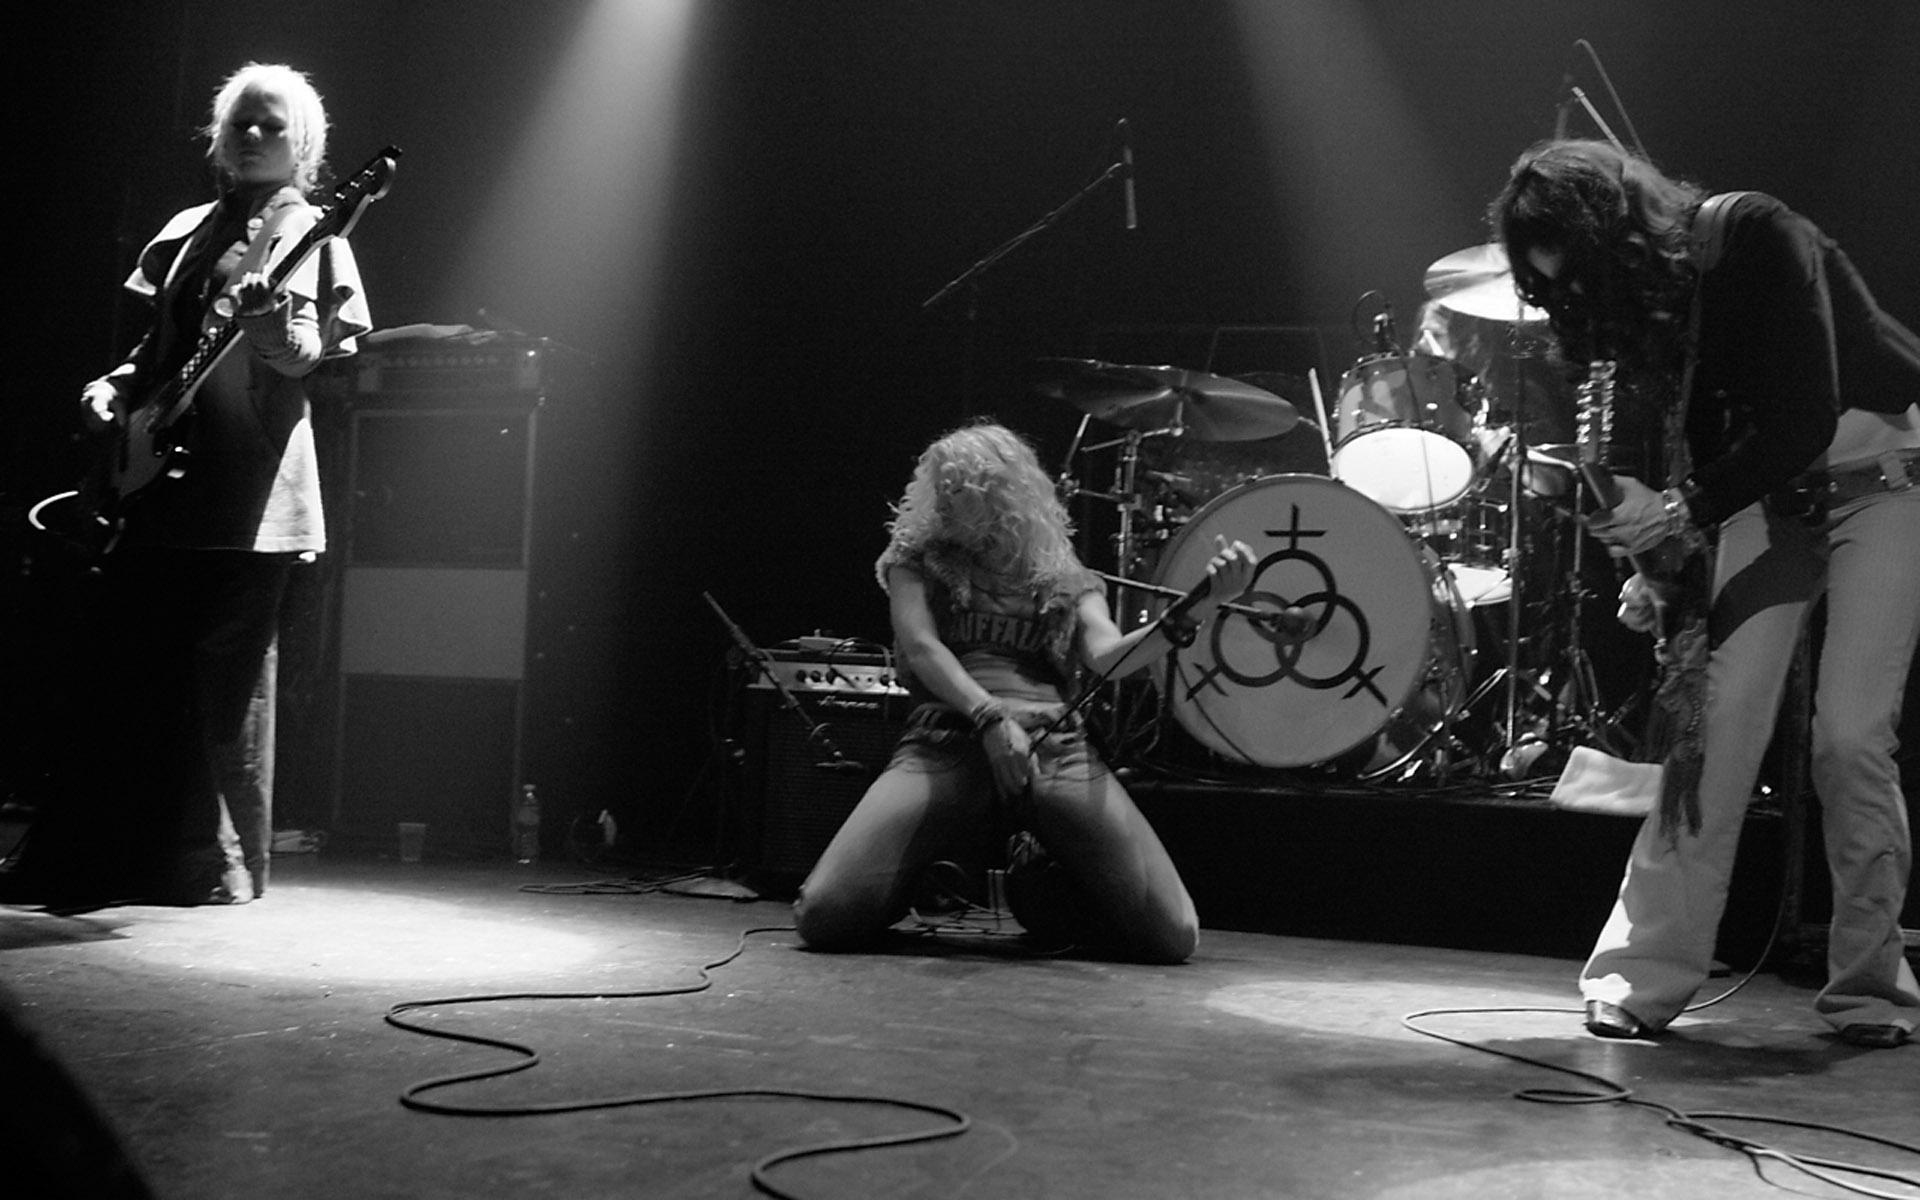 Led Zeppelin Wallpaper Widescreen